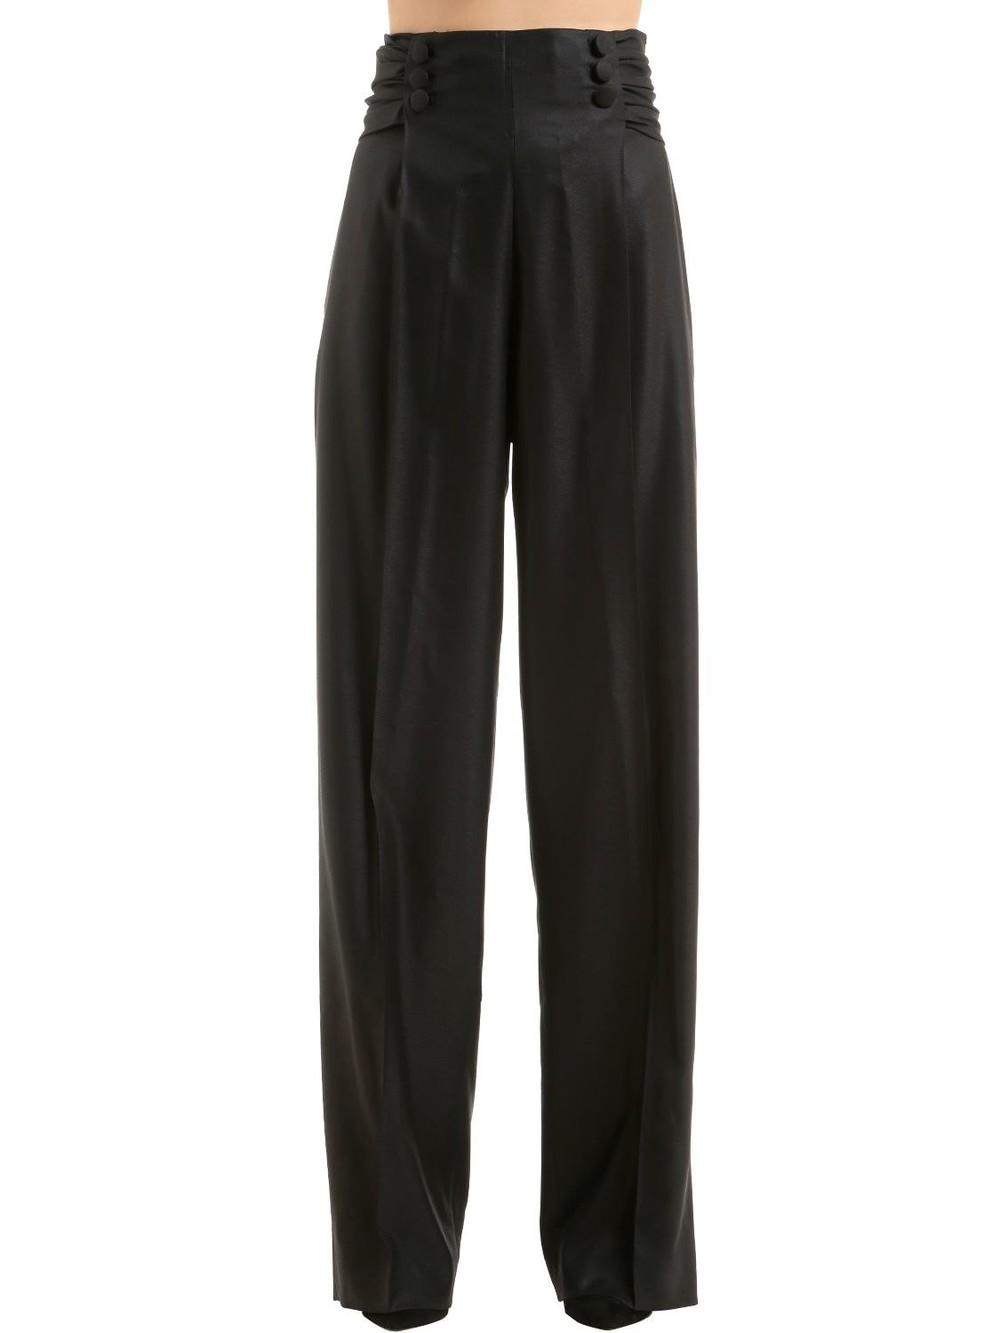 MARCO DE VINCENZO Waxed Wool Palazzo Pants in black